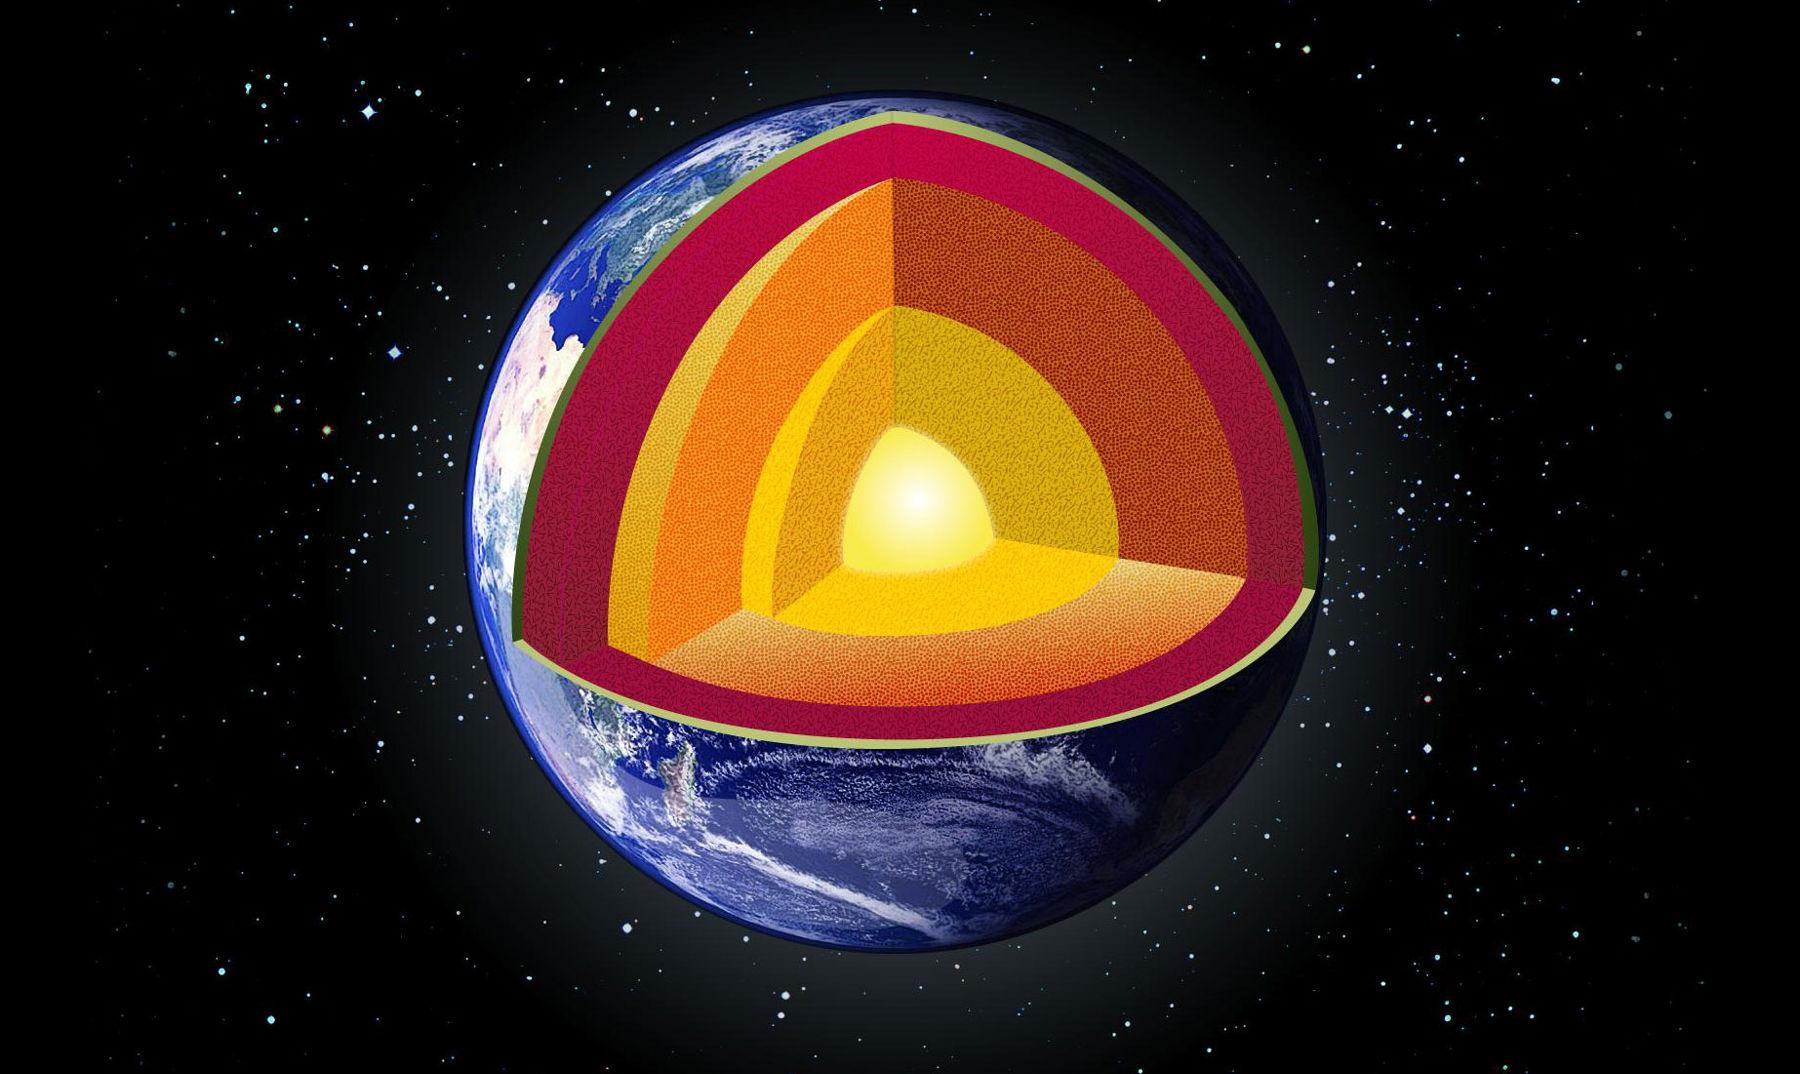 Inge Lehmann, la sismóloga que contradijo a Julio Verne